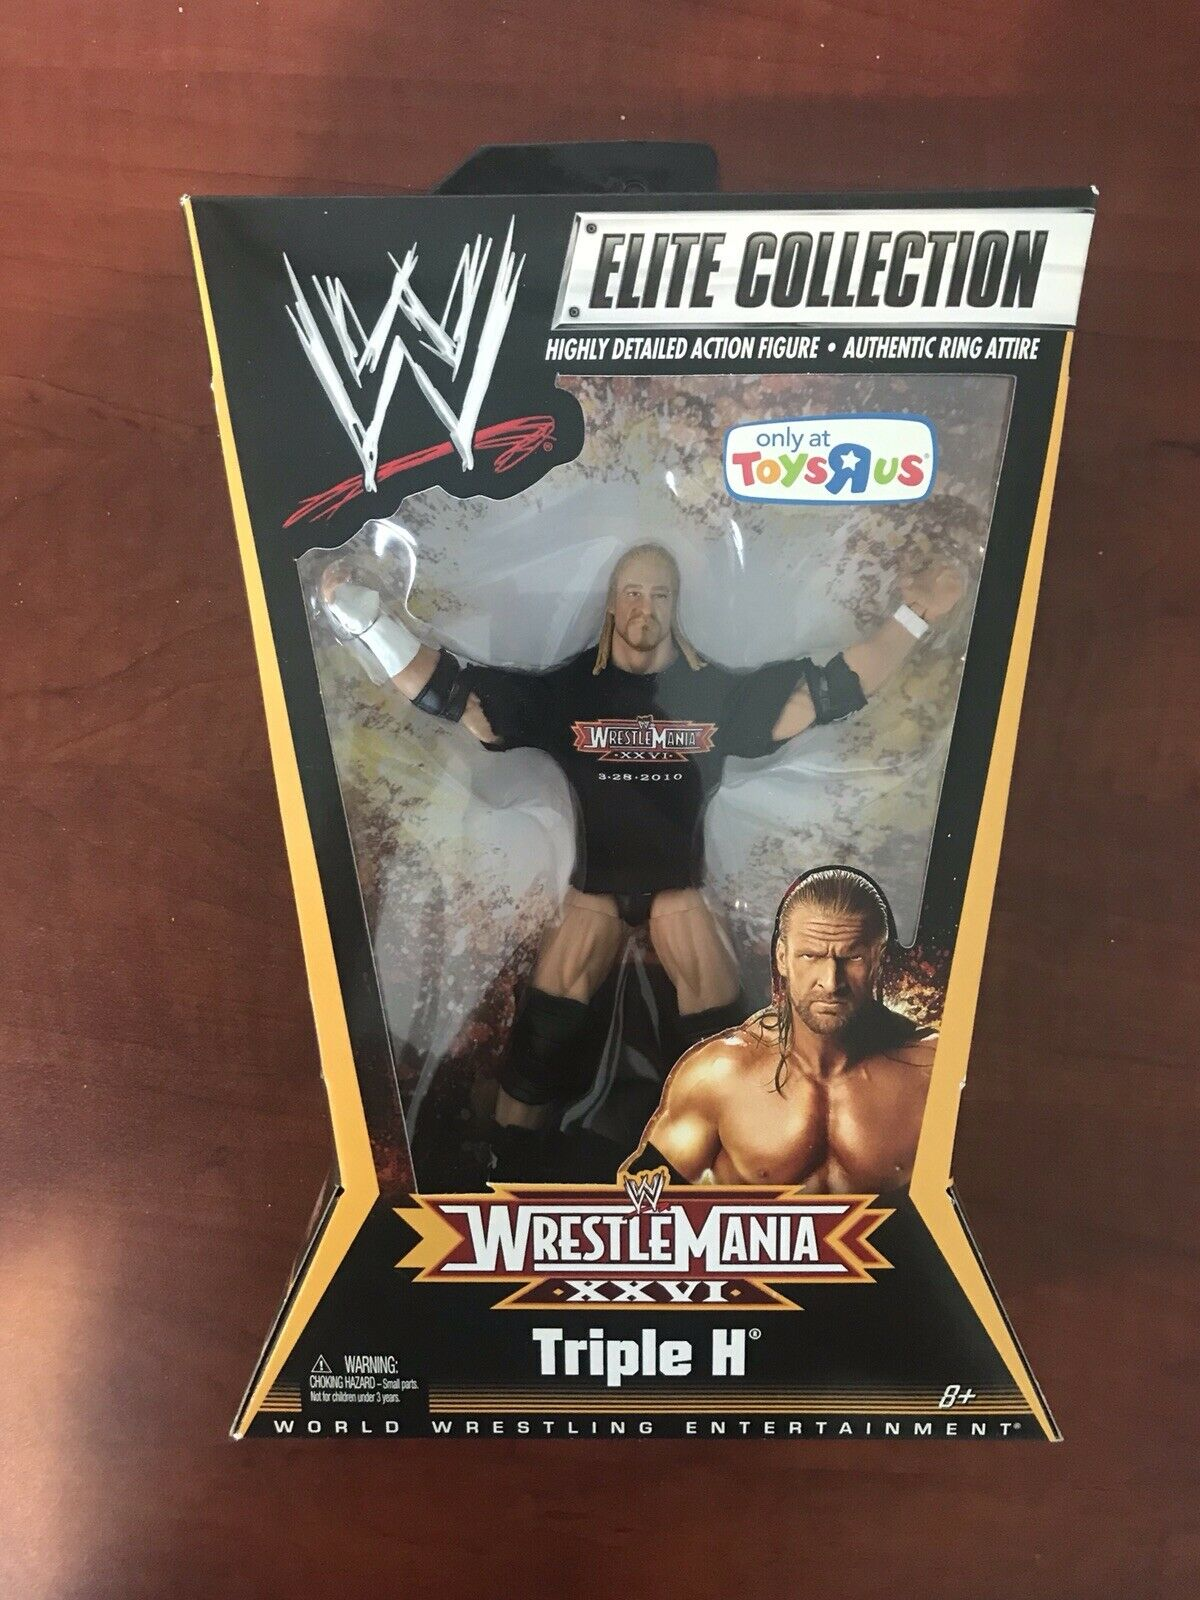 Mattel WWE Elite Collection Triple H Figura WrestleMania XXVI 26 26 Tru MIB difícil de encontrar Hhh  ventas calientes